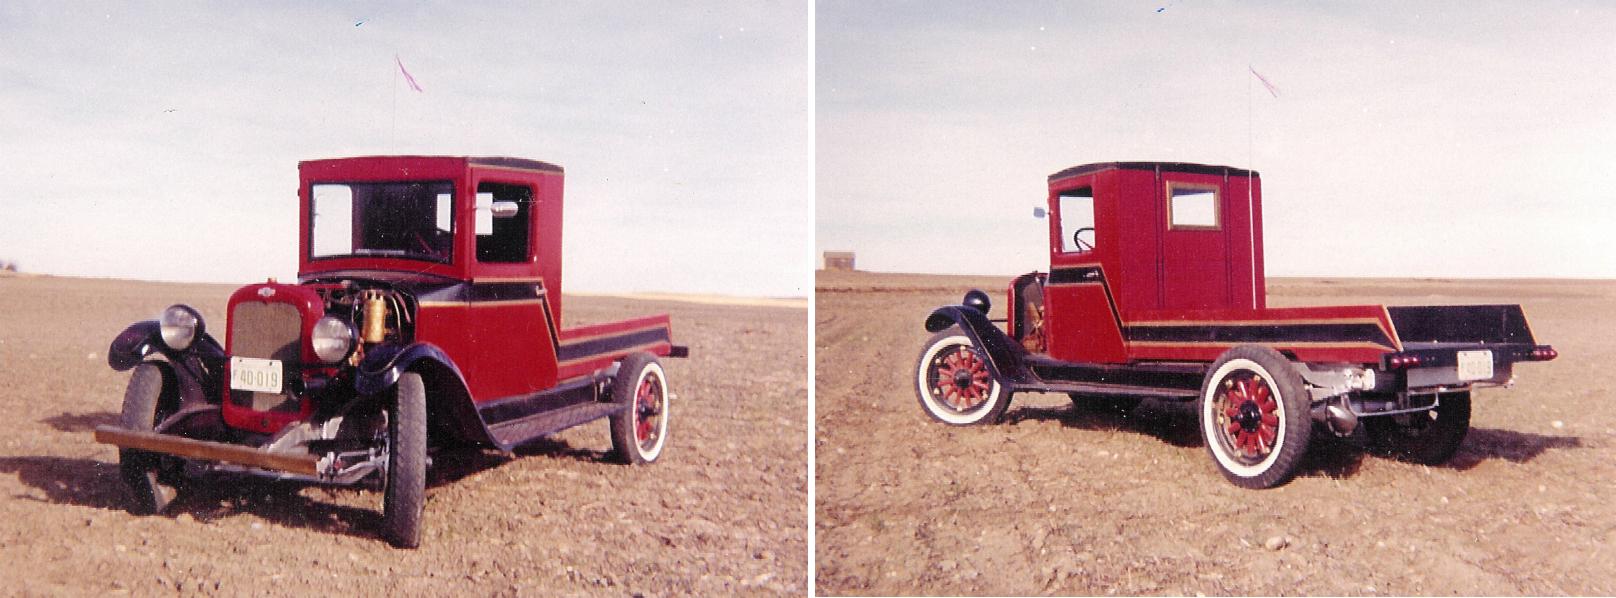 Eye Candy: 1928 Chevrolet Truck